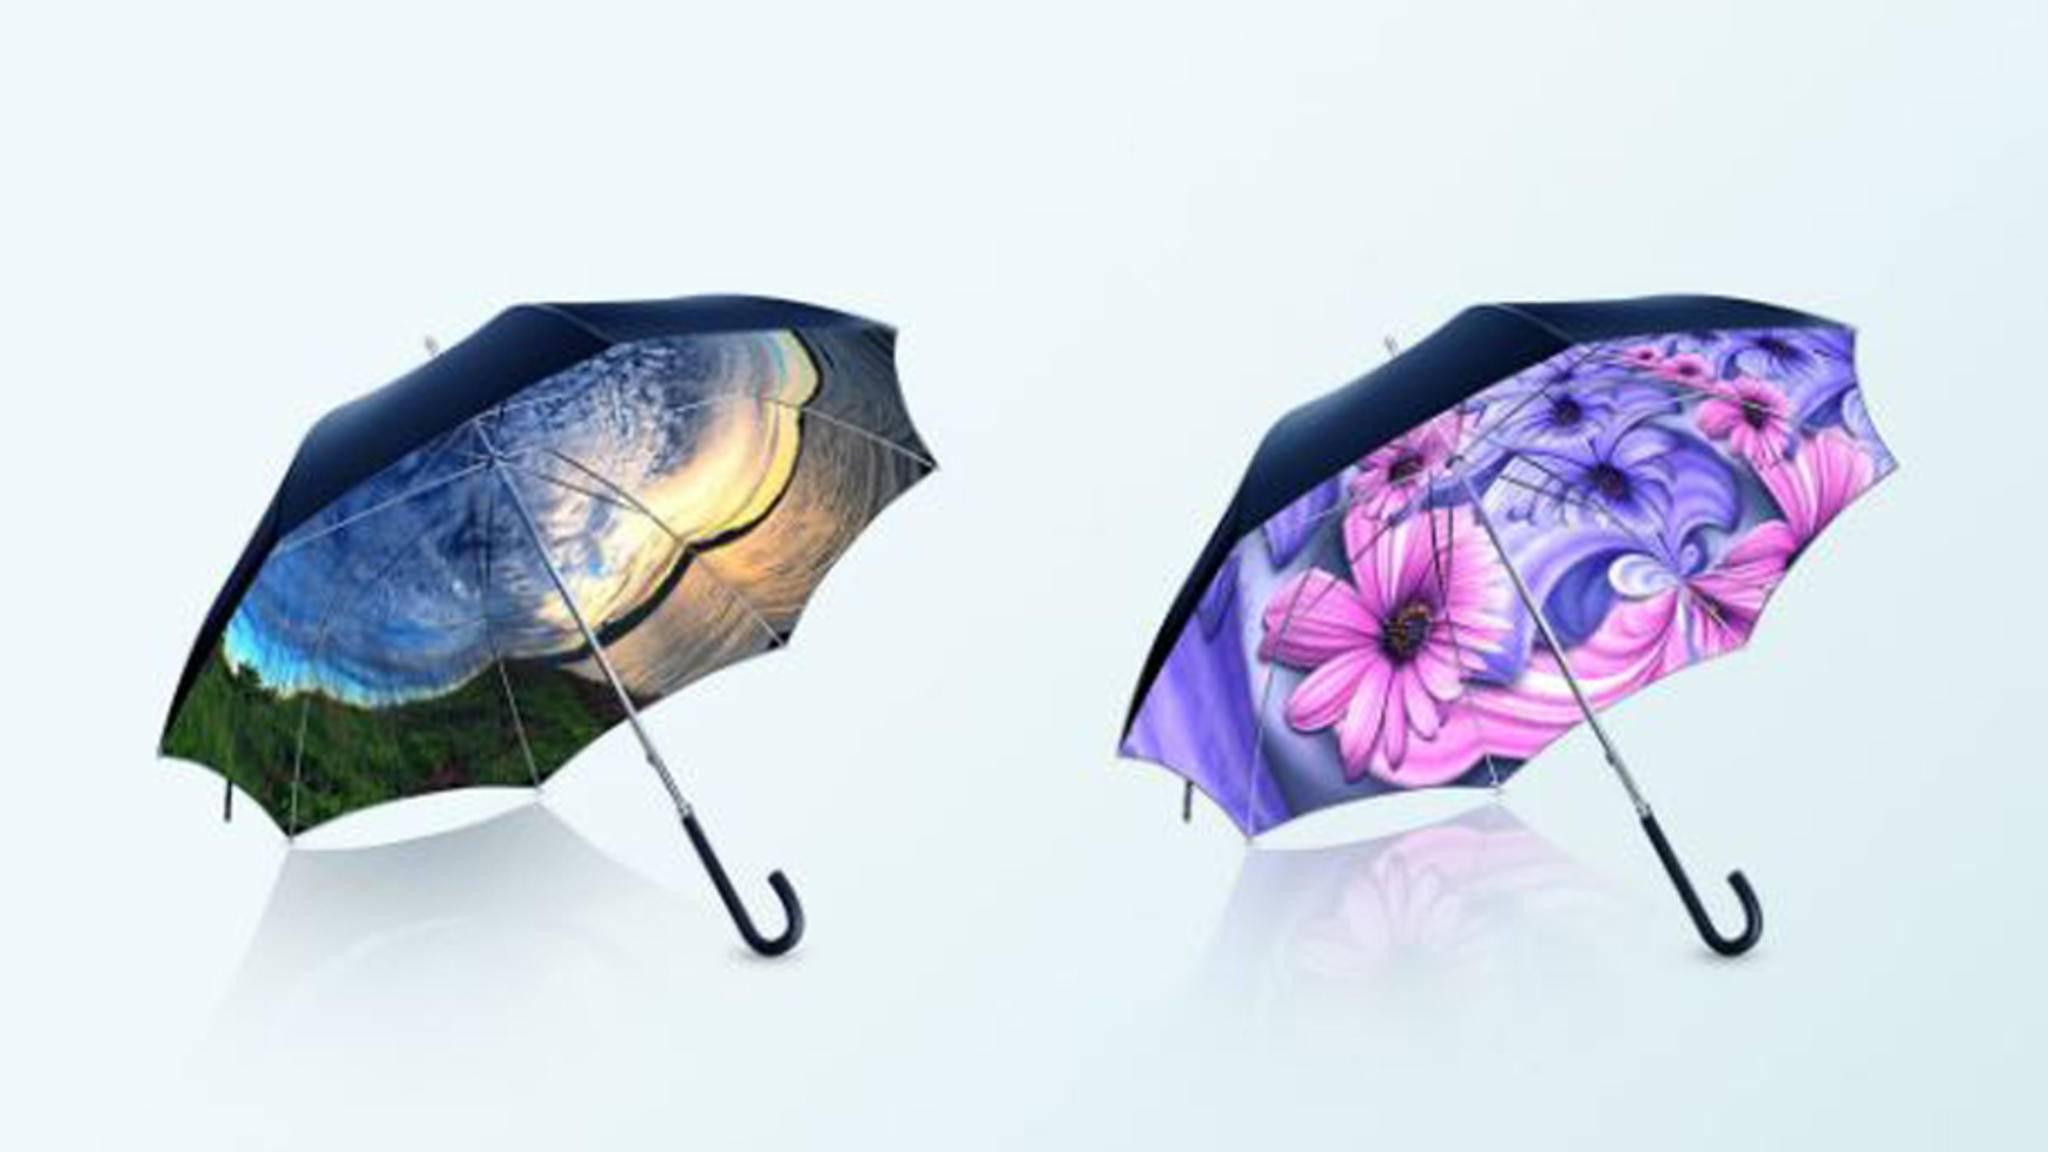 Panorella macht das Regenwetter bunt.